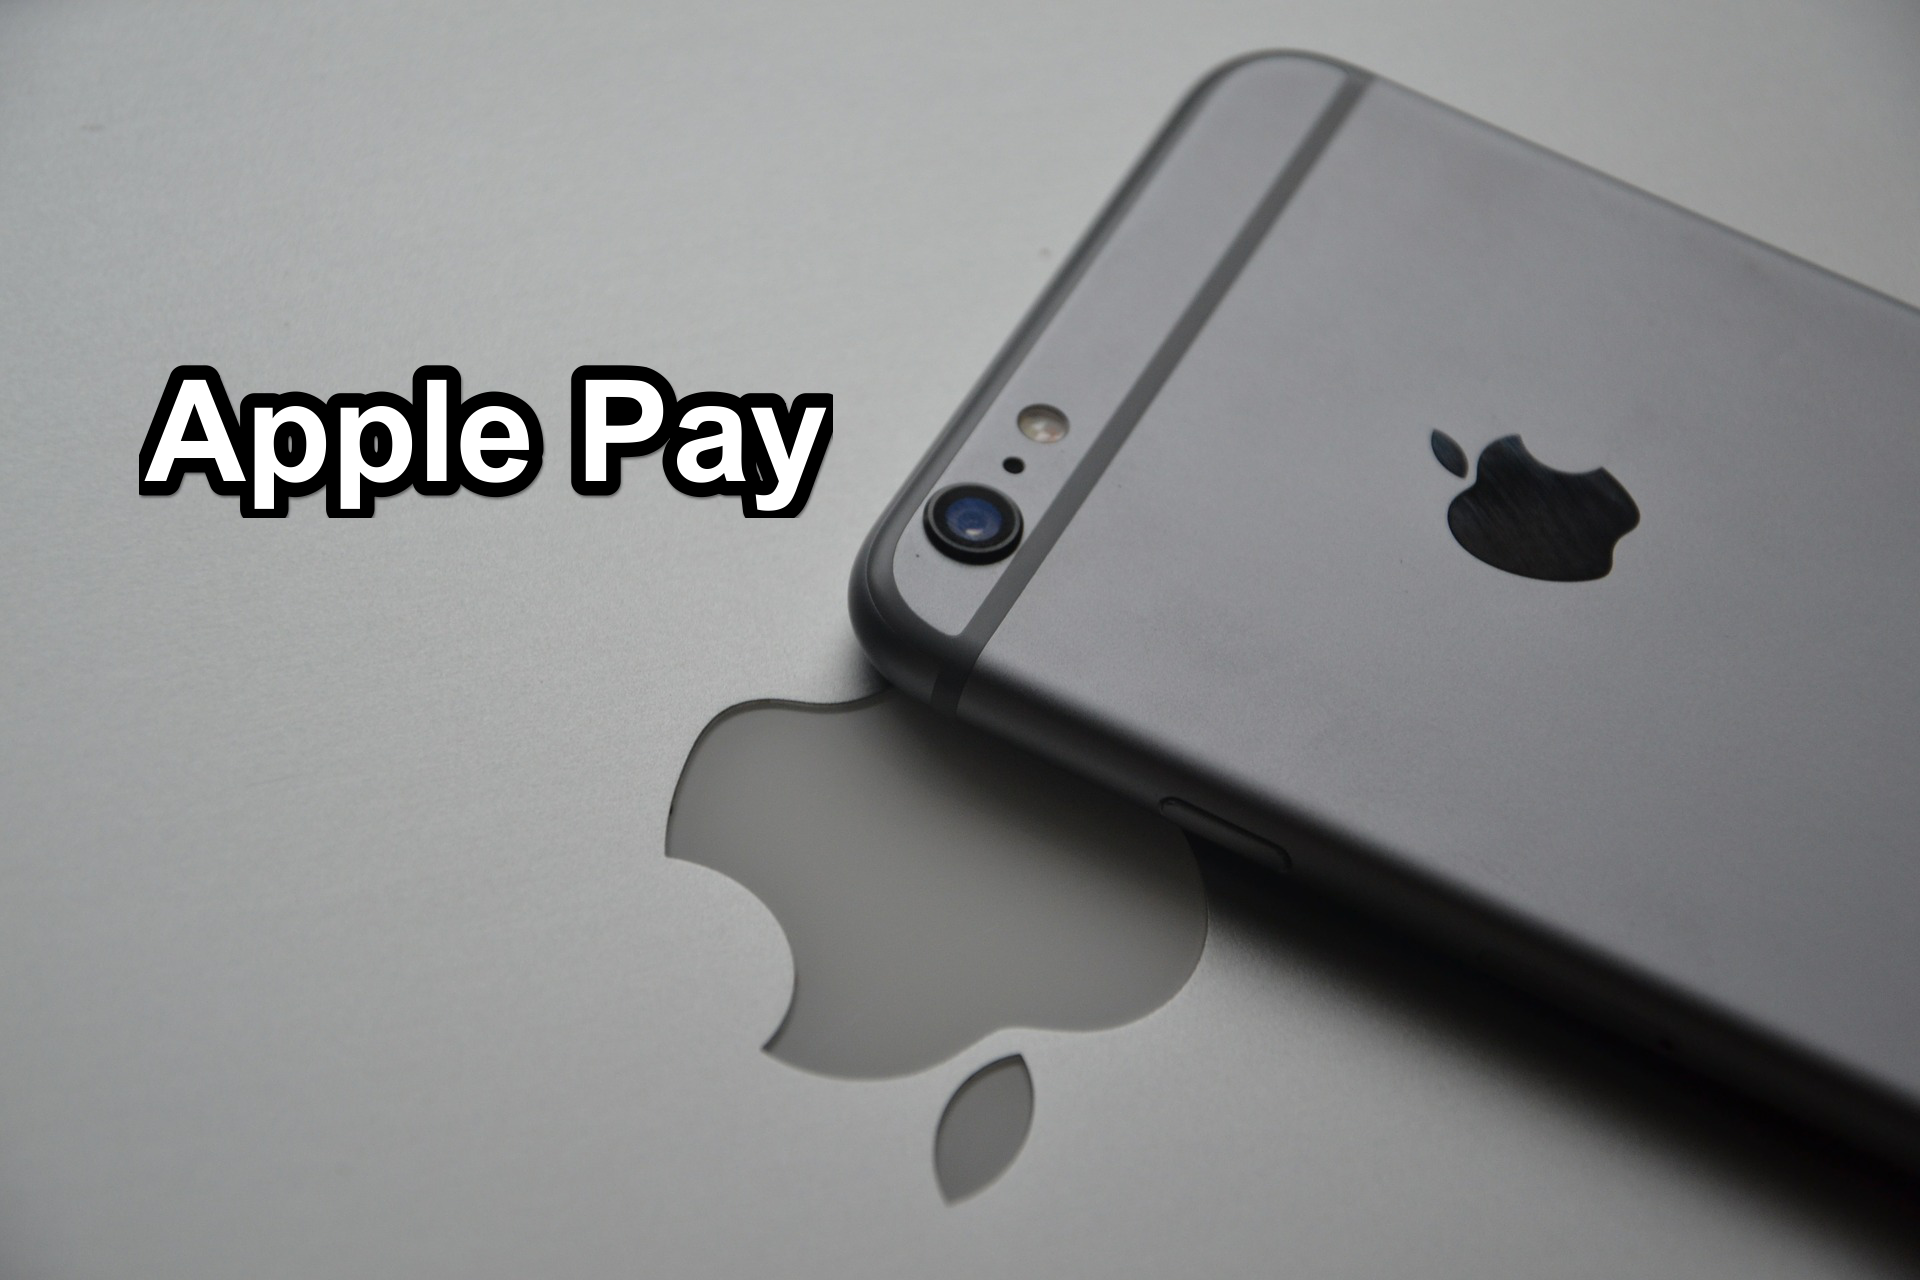 Touch ID搭載の新型MacBook Pro でApple Pay決済を試してみた